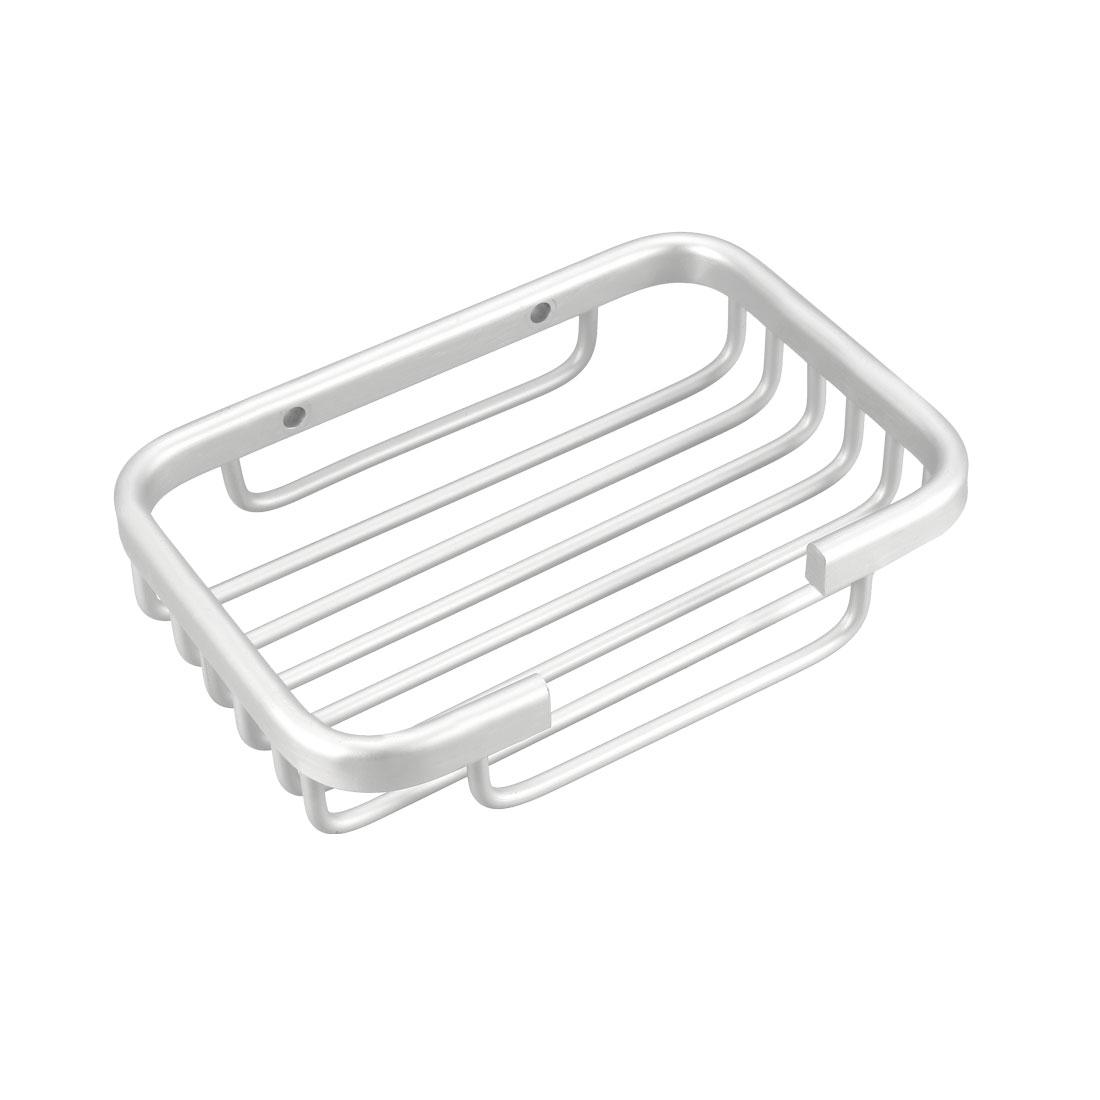 Soap Dish Holder Aluminum Wall Mounted Tray with Installation Kits (Silver)